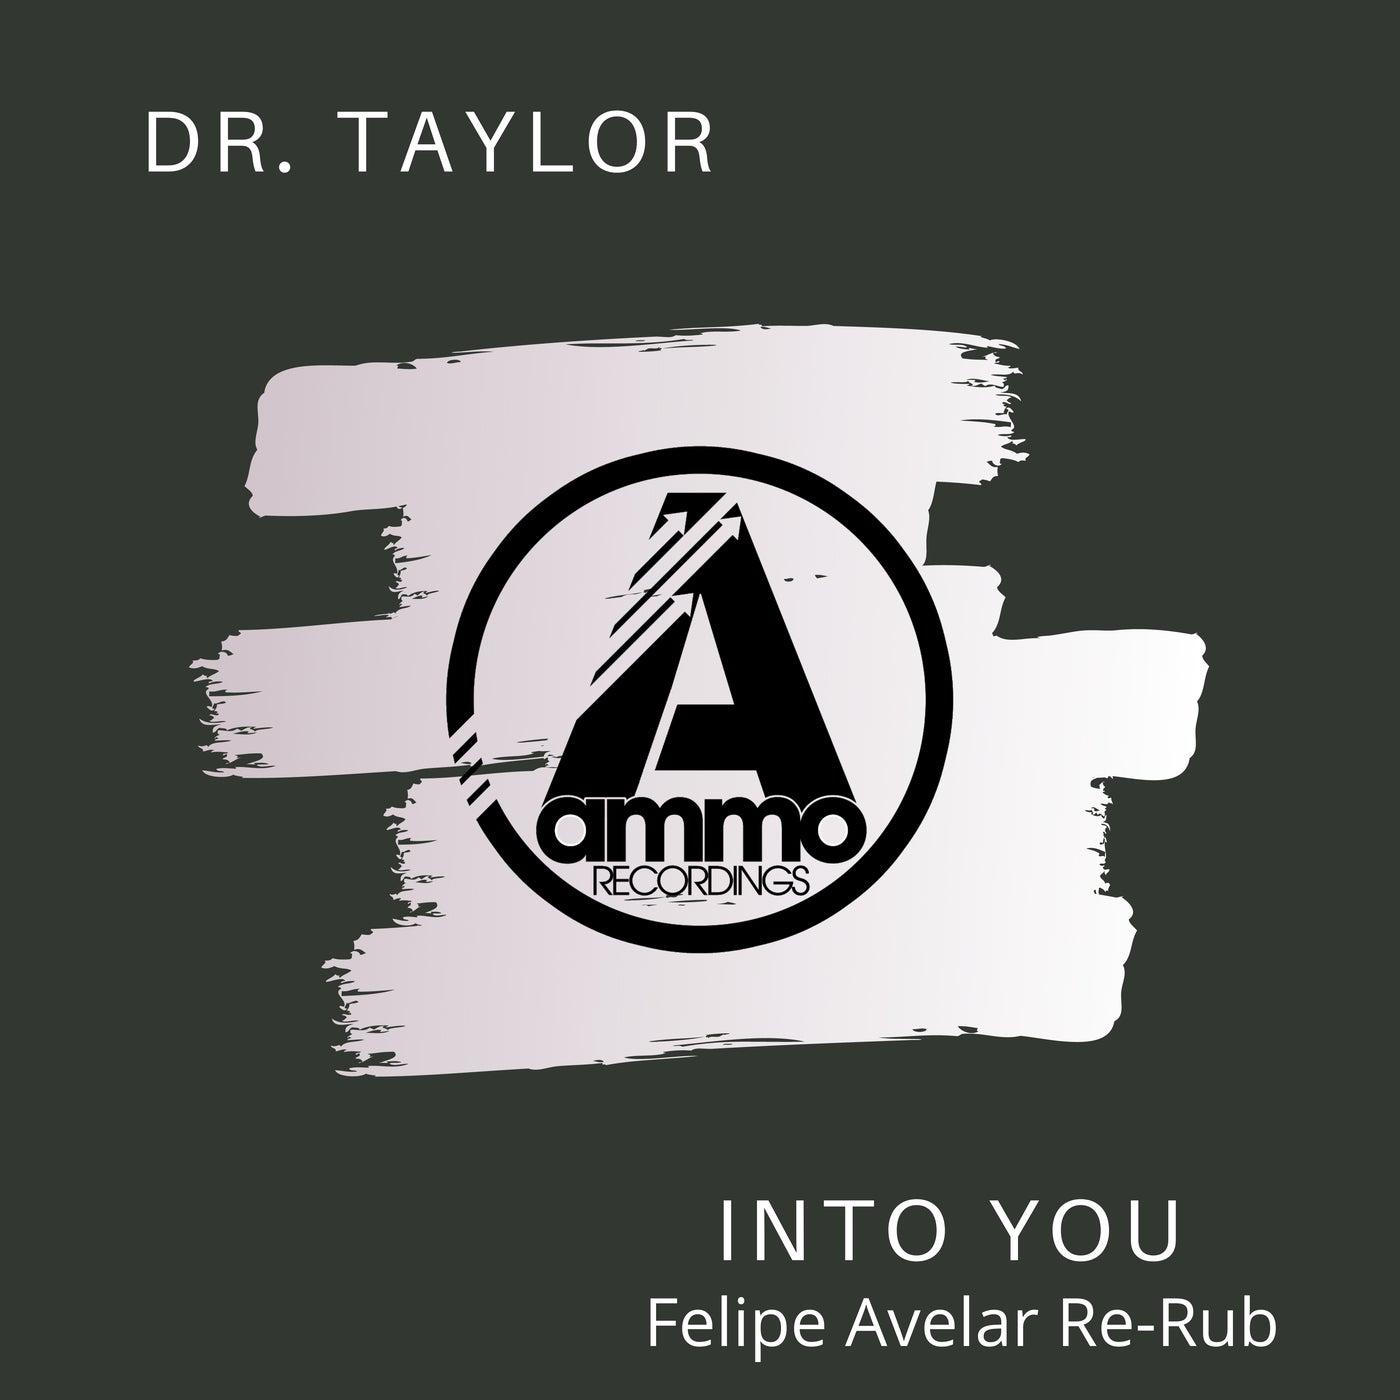 Into You (Felipe Avelar Re-Rub)